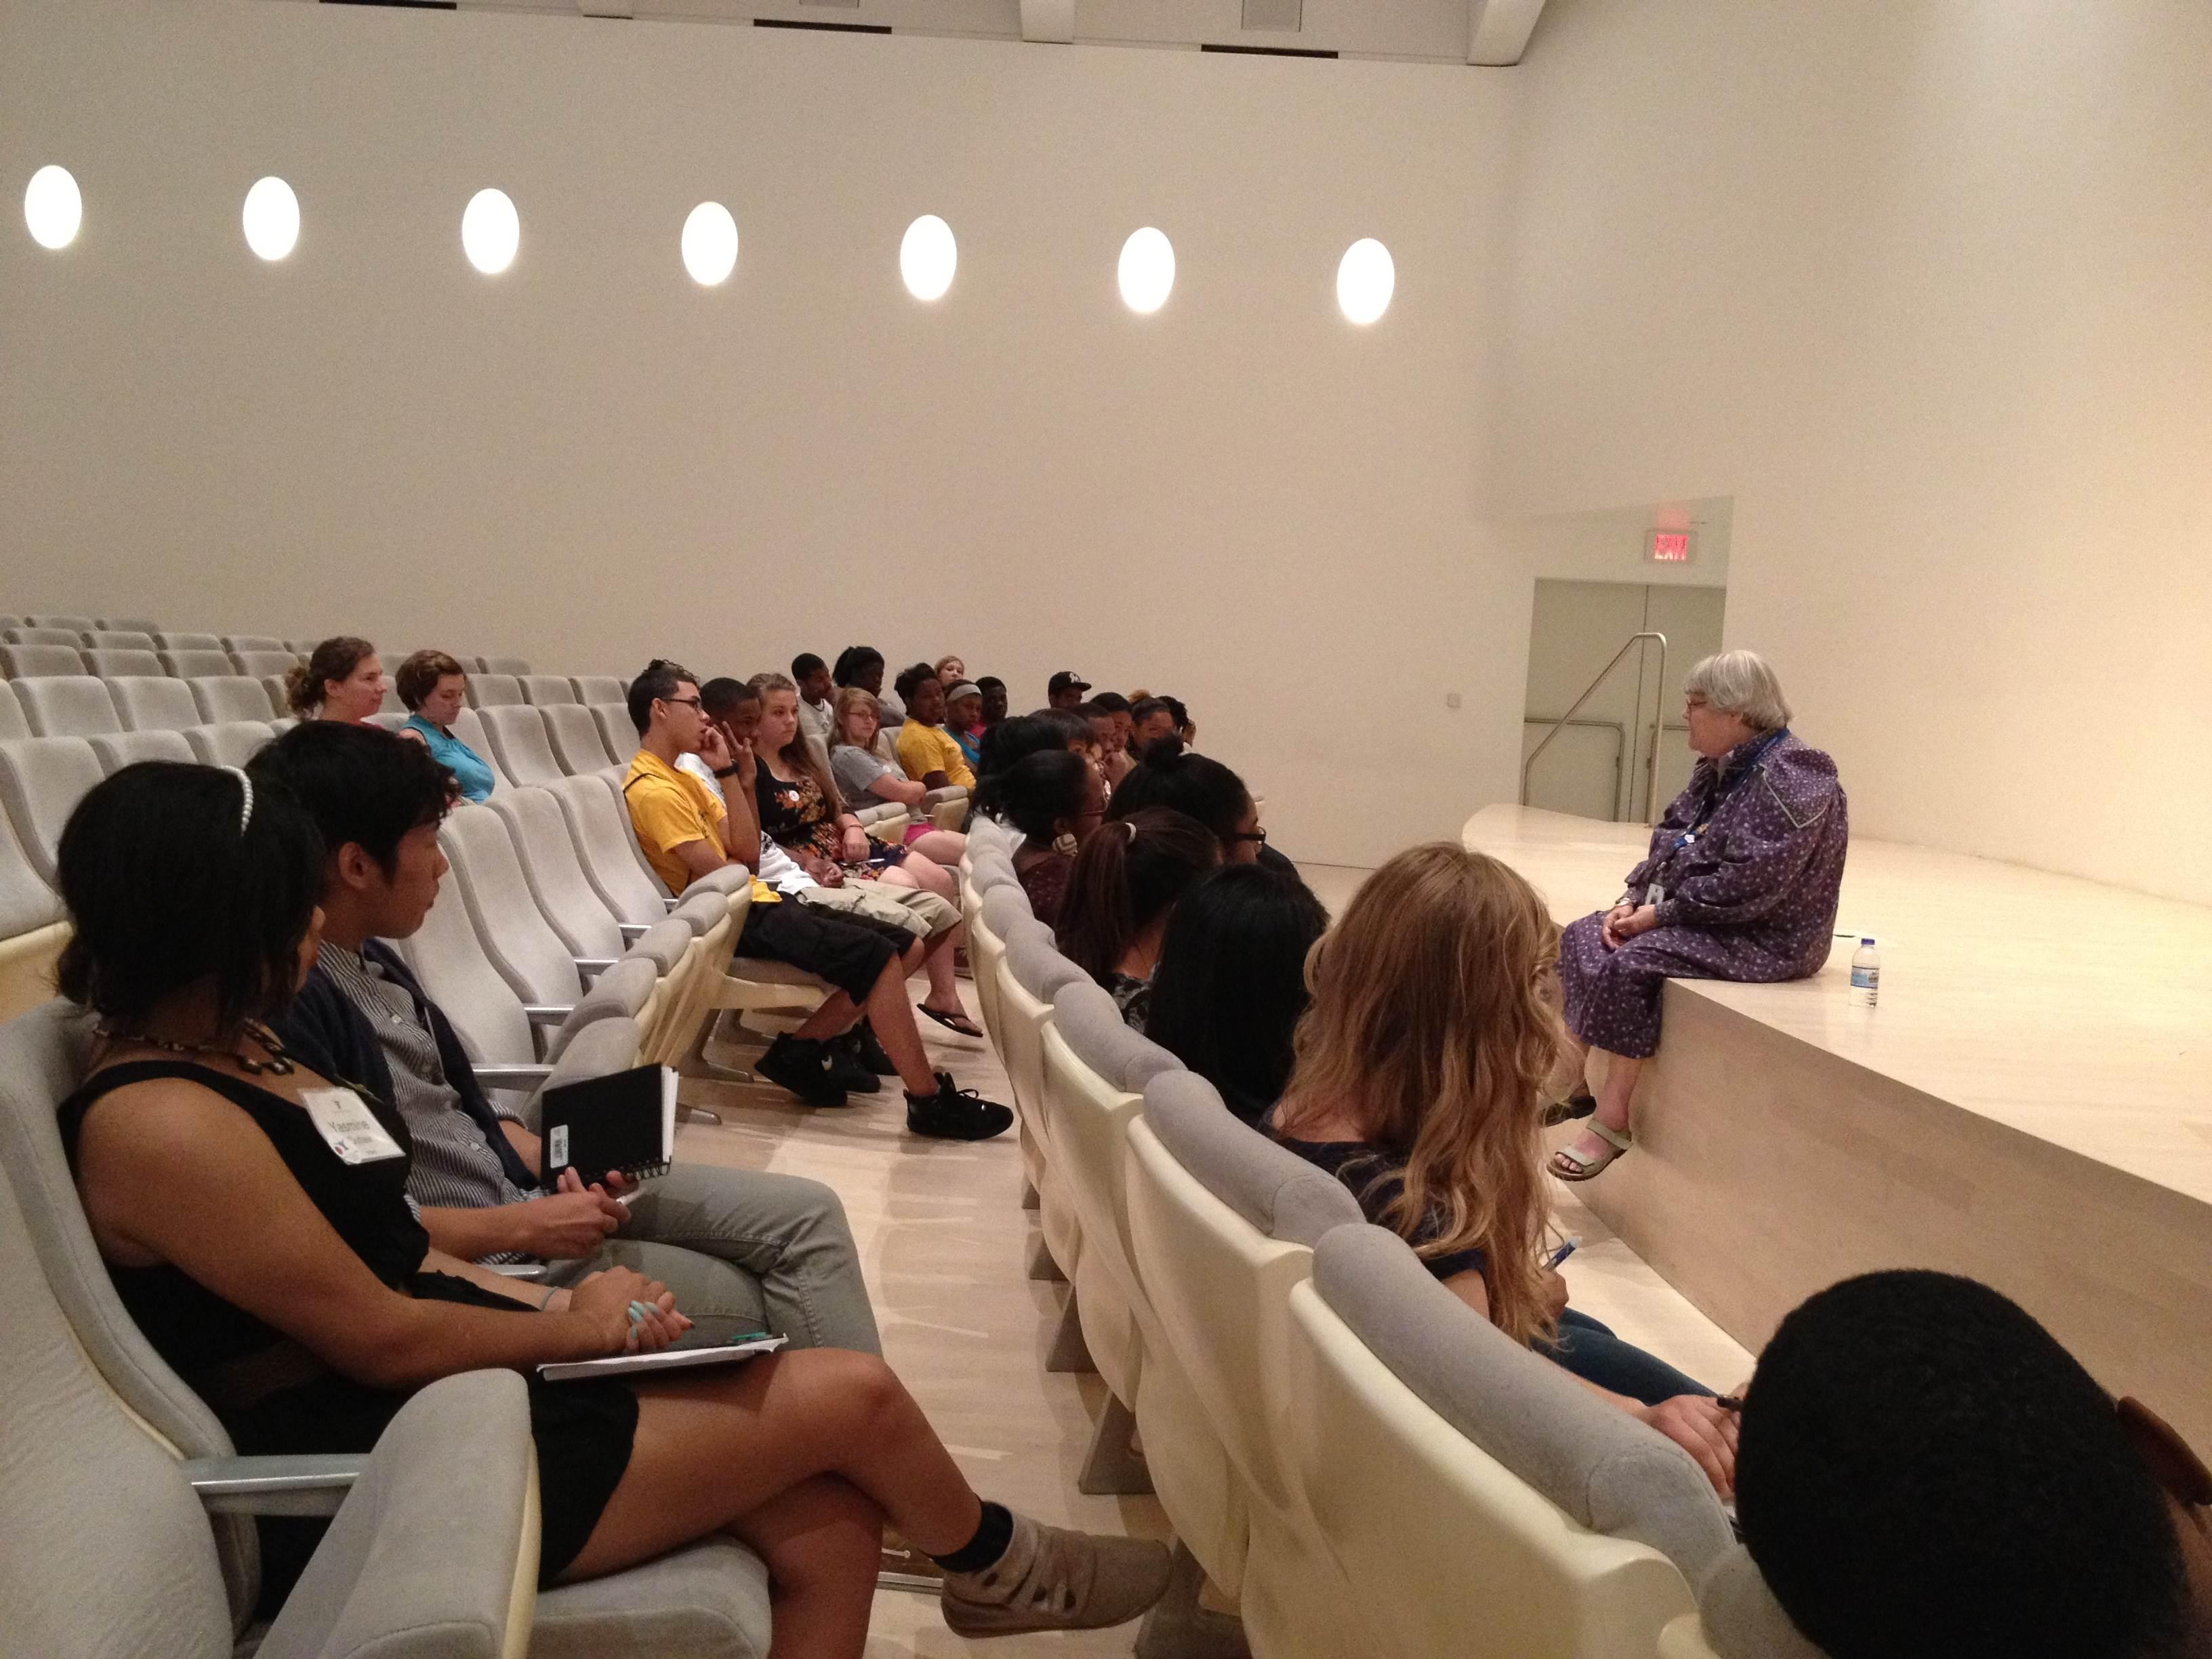 Barbara Brown Lee Milwaukee Art Museum Chief Educator Talks To The City Wide